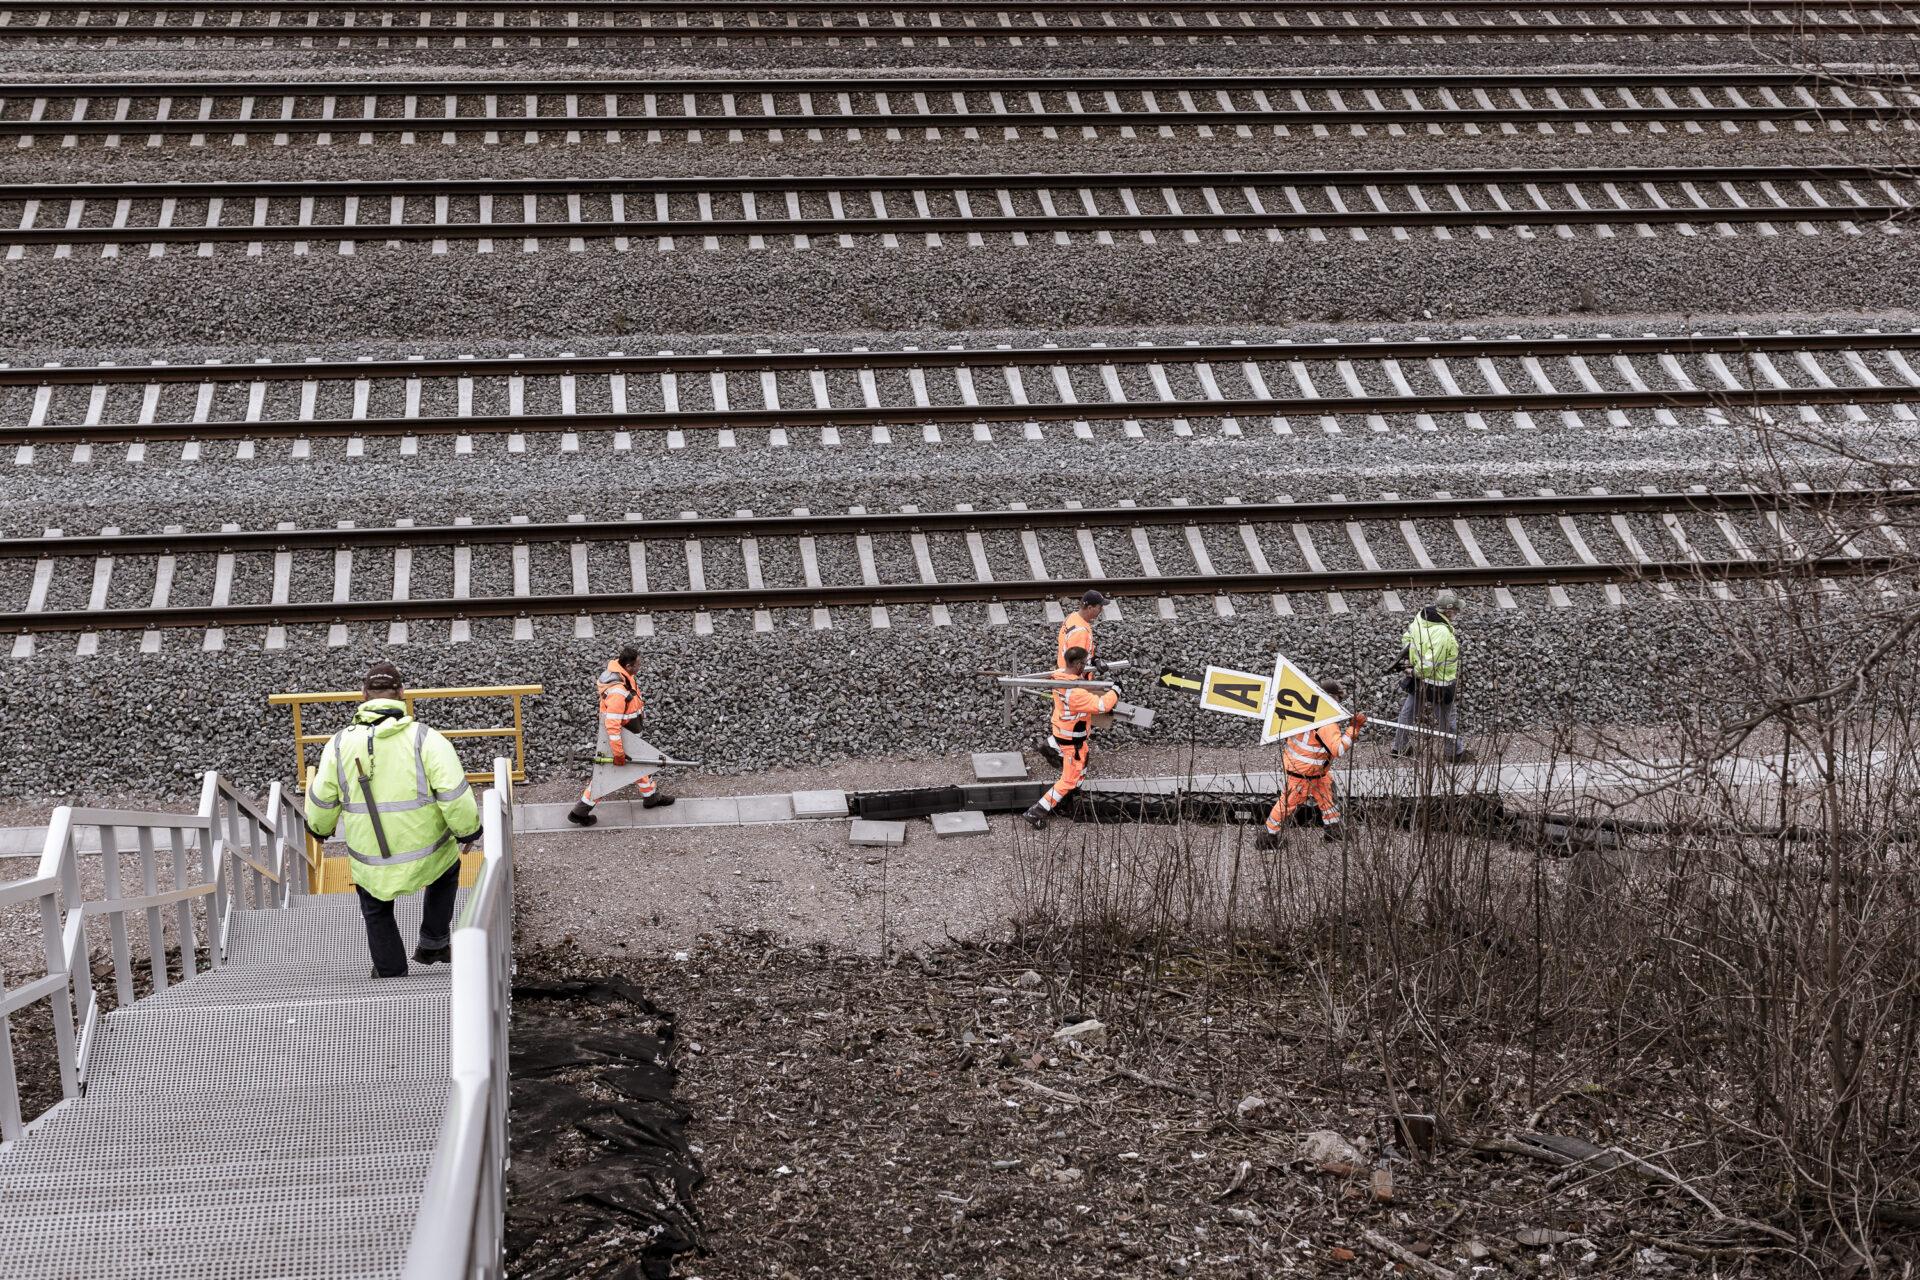 Arbeit, Arbeiter, Bahn, Bahntechnik, FES, FES Bahntechnik, Gleisbau, Mitarbeiter, Schiene, Zug, arbeiten, baustelle, technik